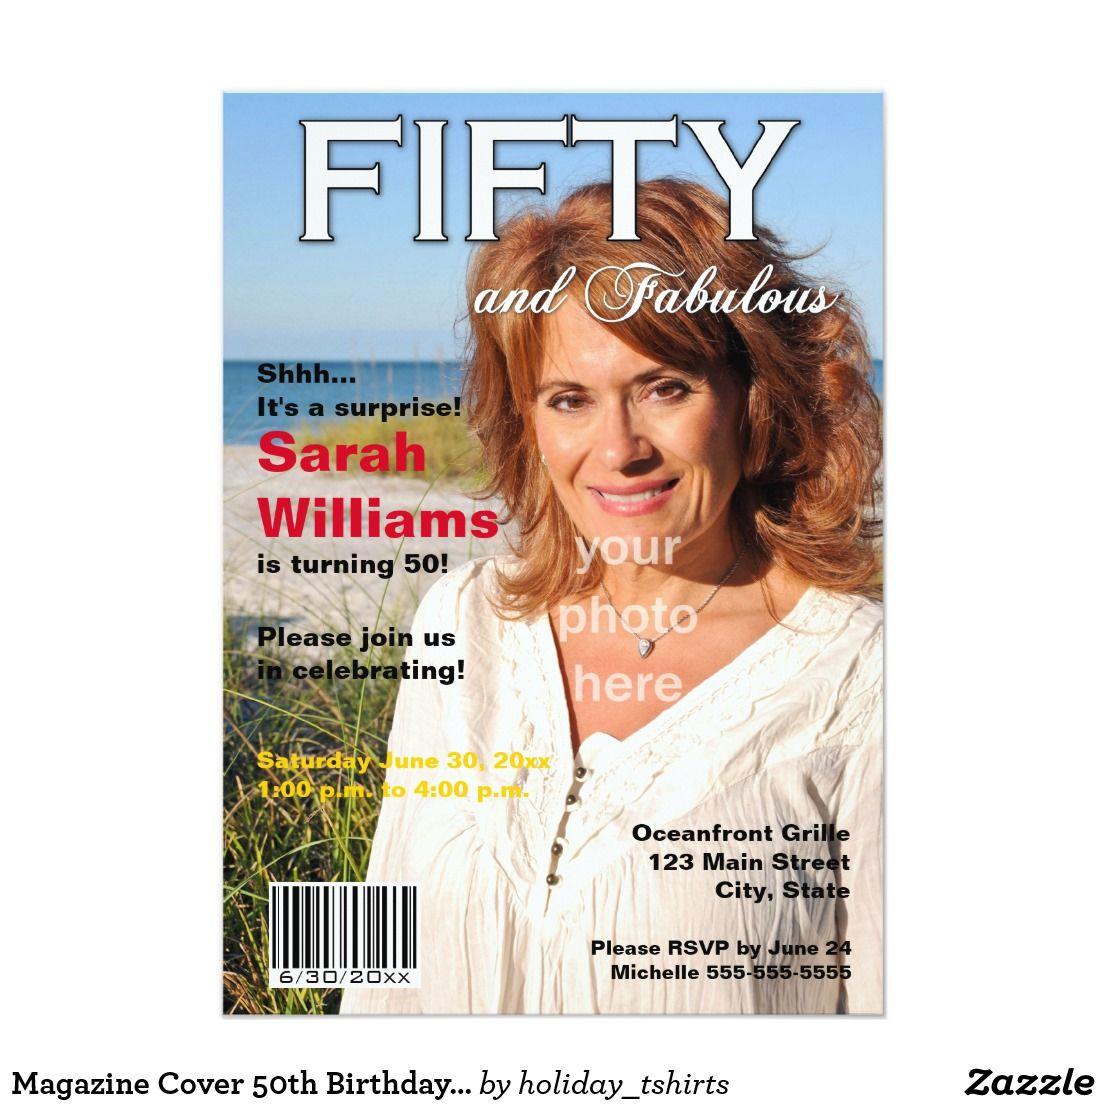 Magazine Cover 50th Birthday Party Invitation | 50th birthday party ...